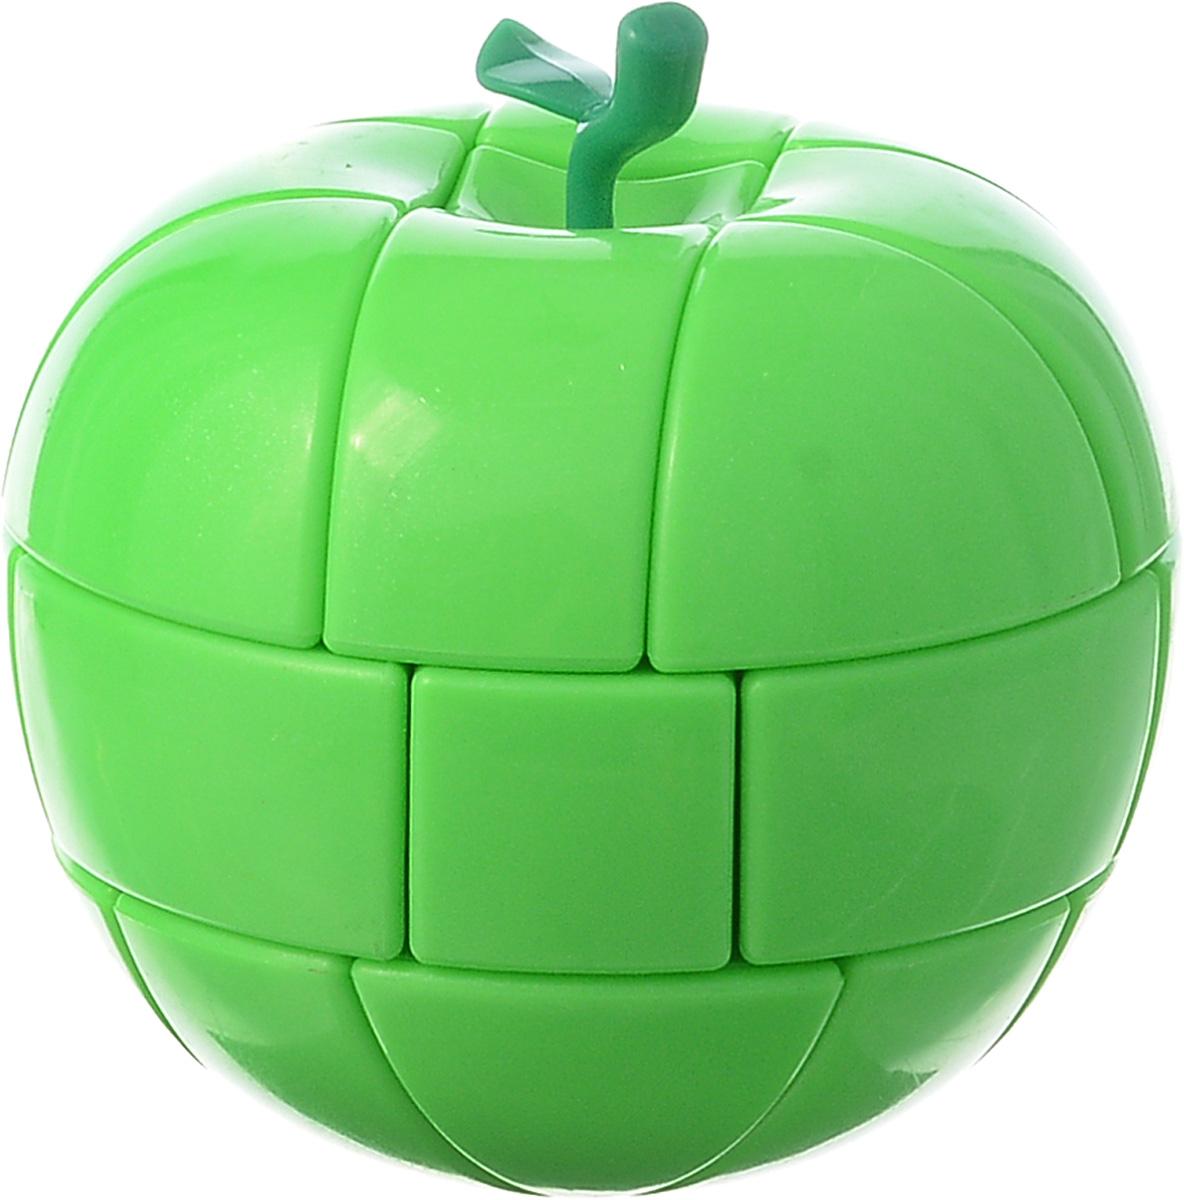 цена Головоломка Junfa Toys Кубикубс, ZY774018 онлайн в 2017 году